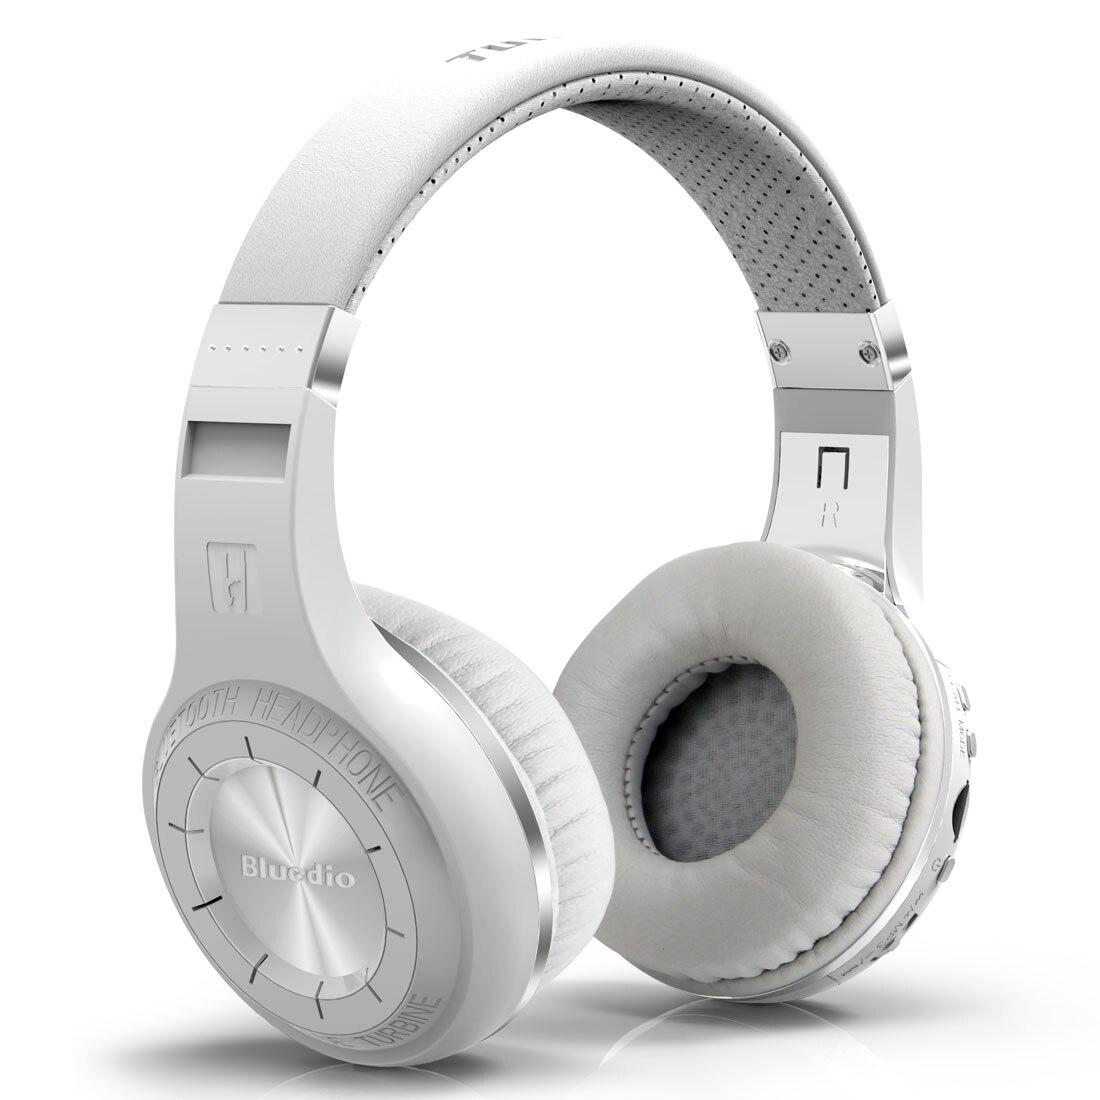 ФОТО 100% Bluedio H+ Bluetooth Stereo Wireless headphones Mic Micro-SD port FM Radio BT4.1 Over-ear headphones